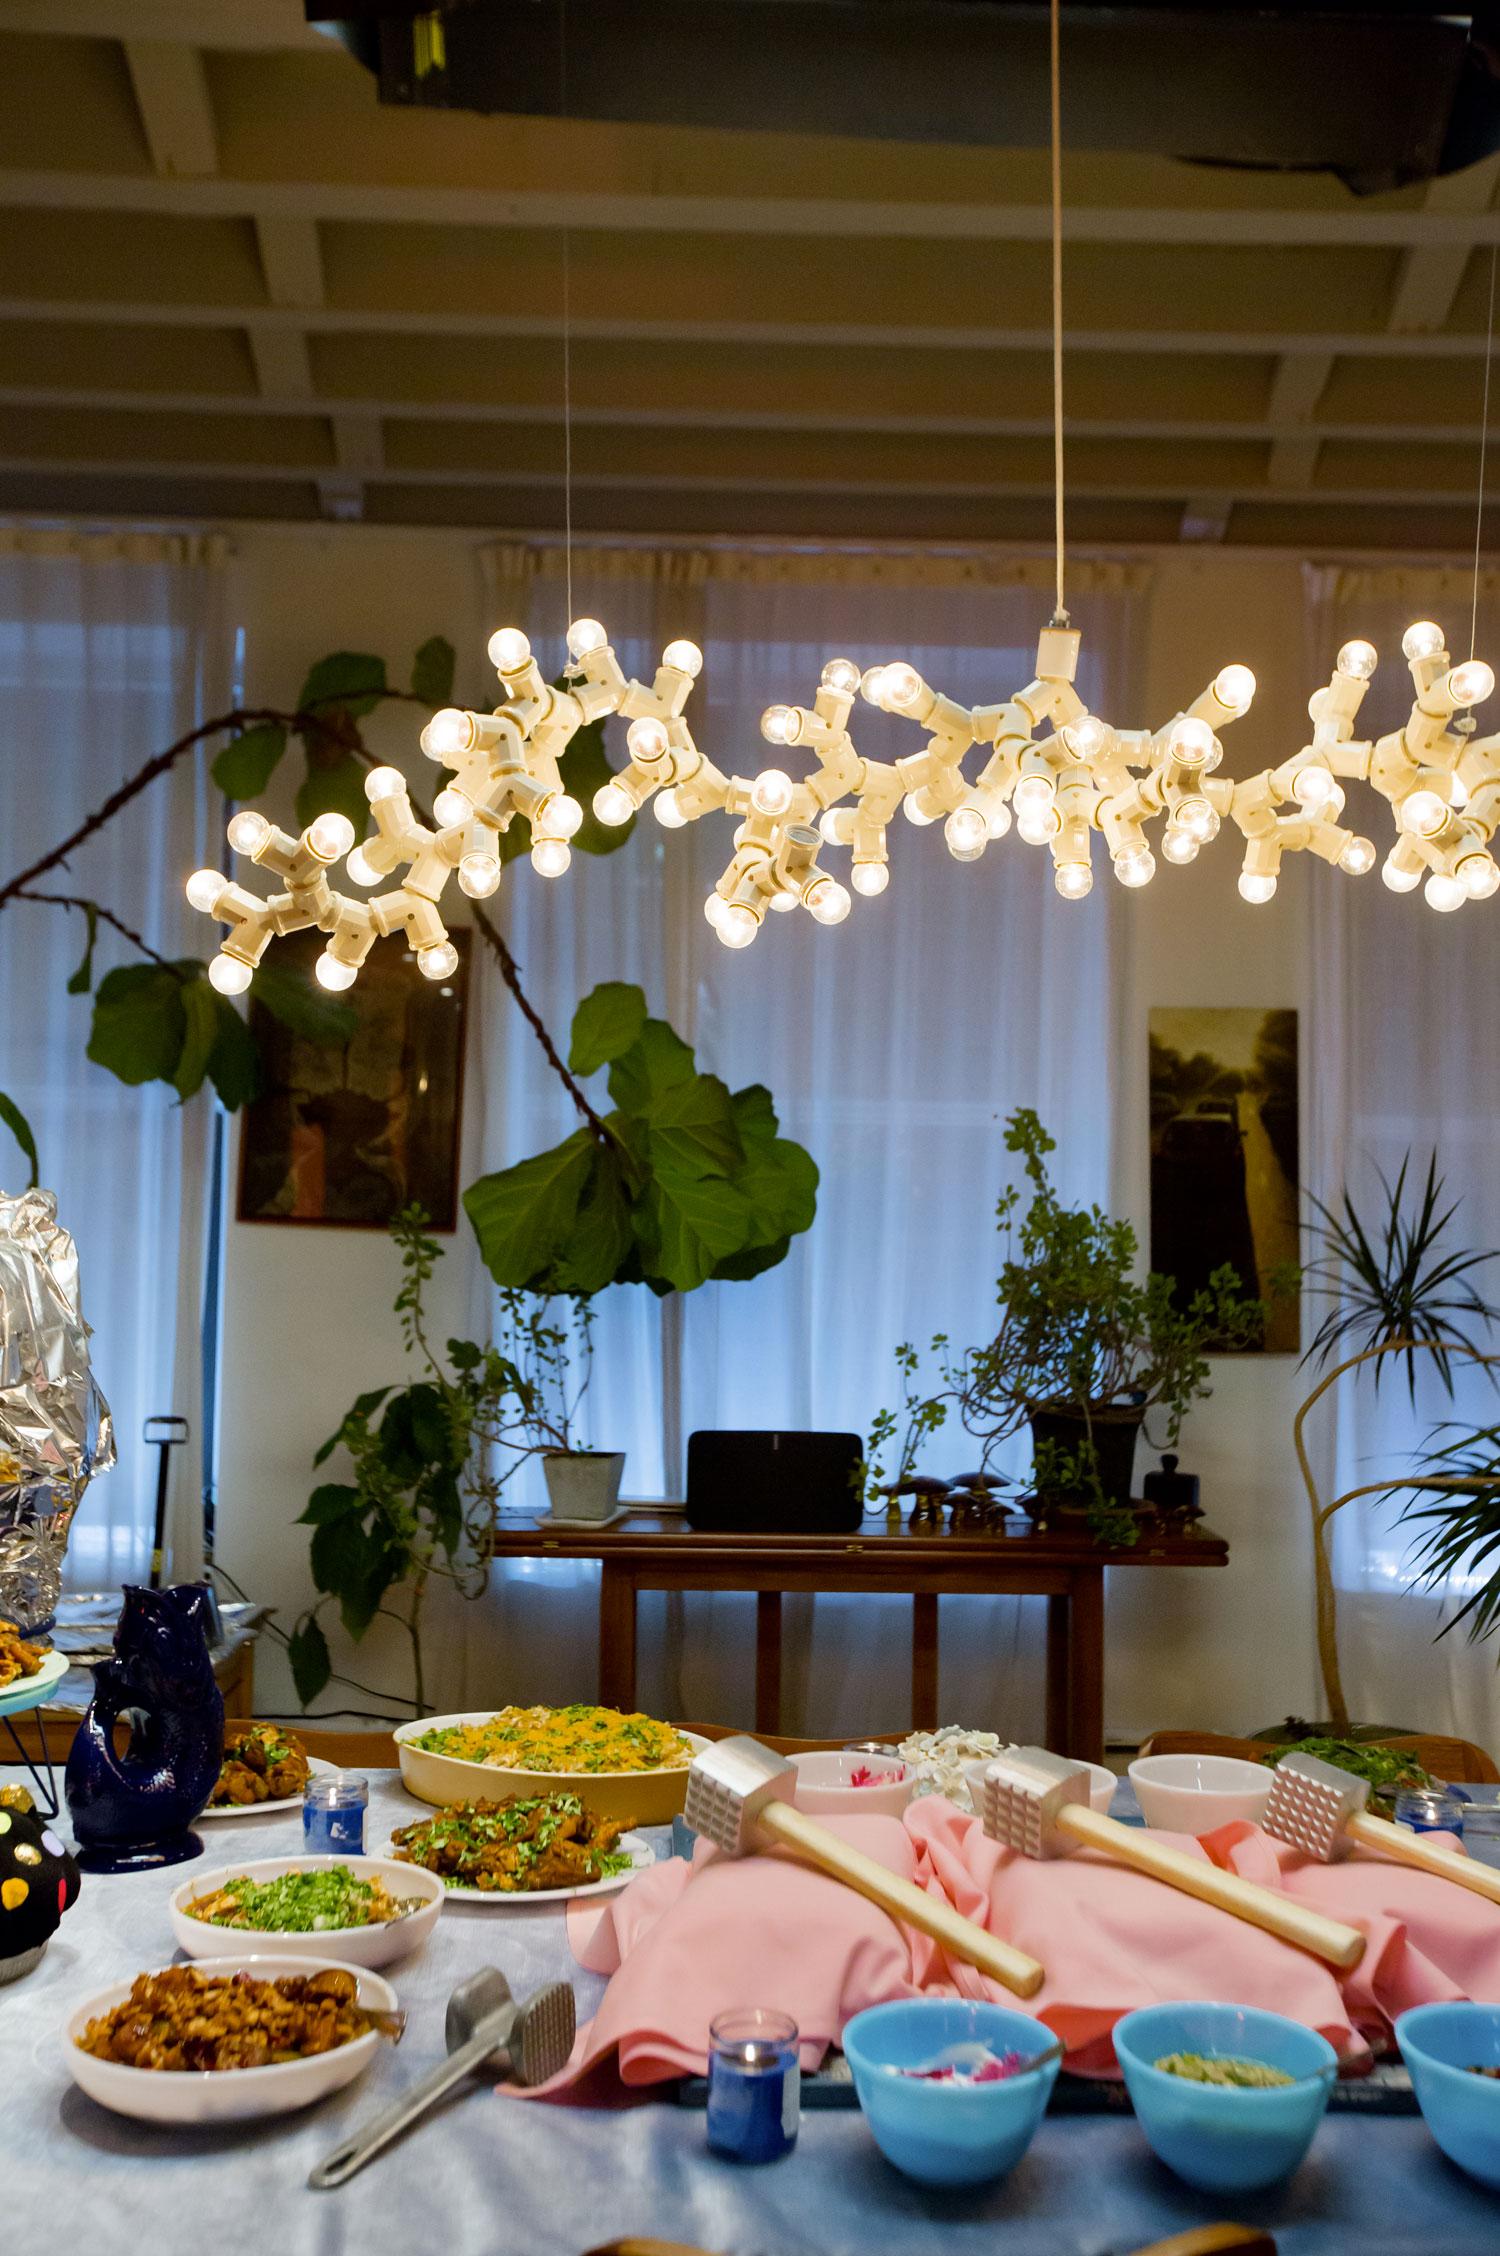 sonos-mind-of-a-chef-potluck-music-special-interior-1